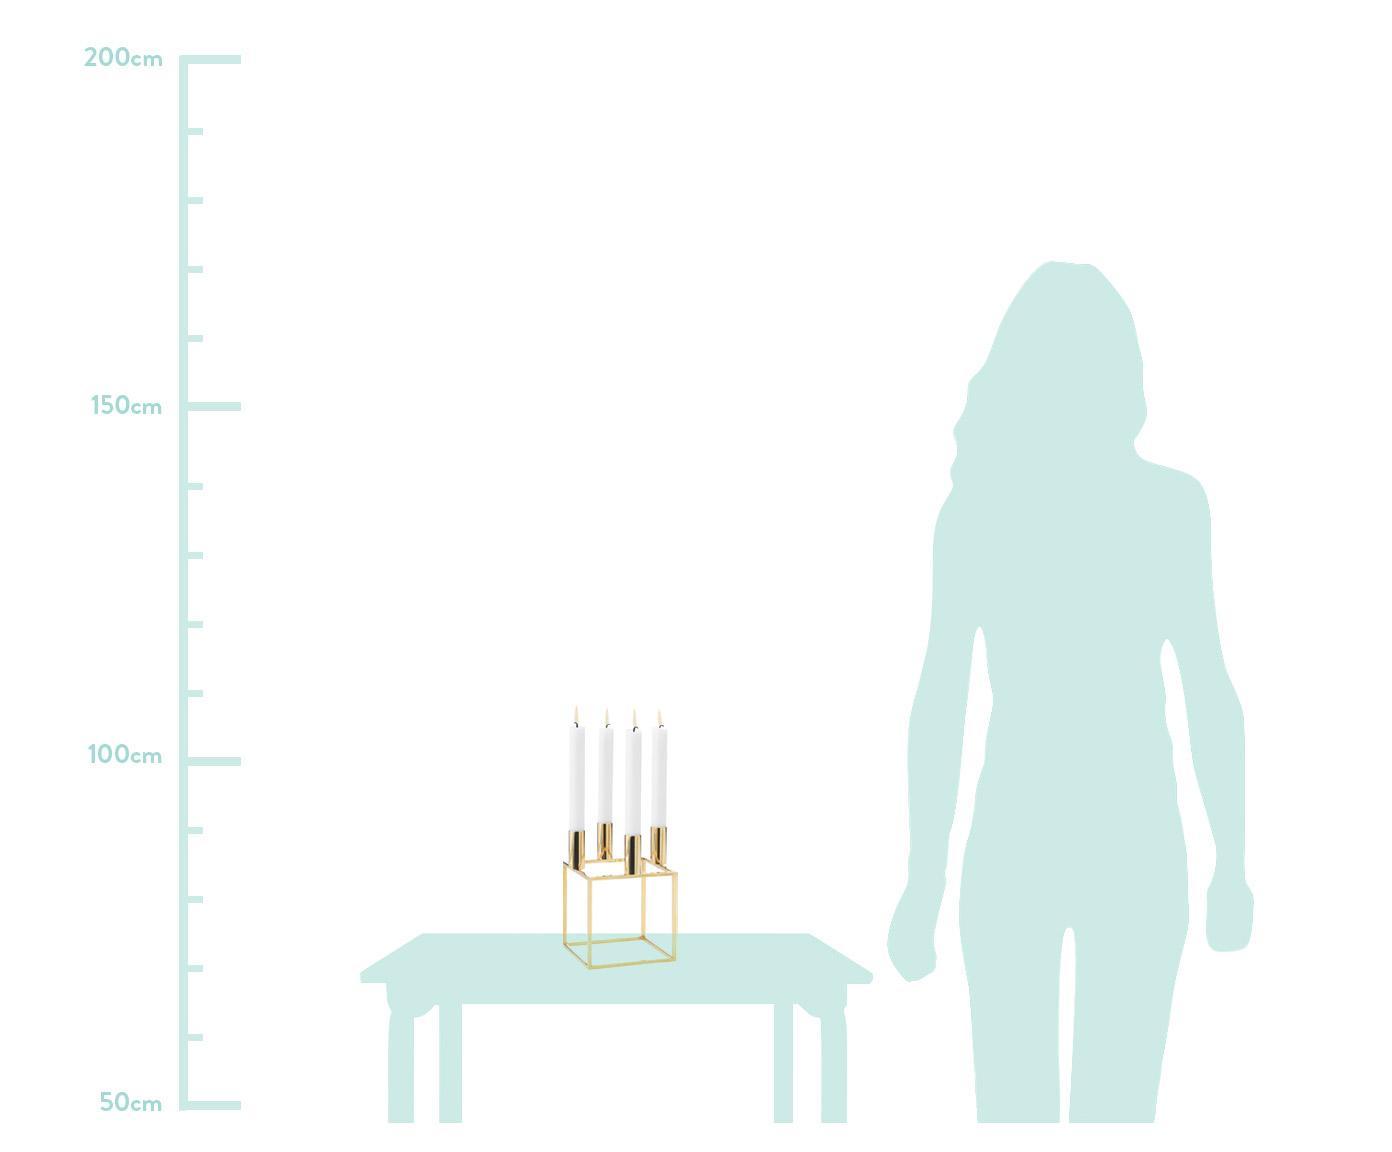 Kerzenhalter Kubus, Stahl, vermessingt, gebürstet, Messing, 14 x 20 cm